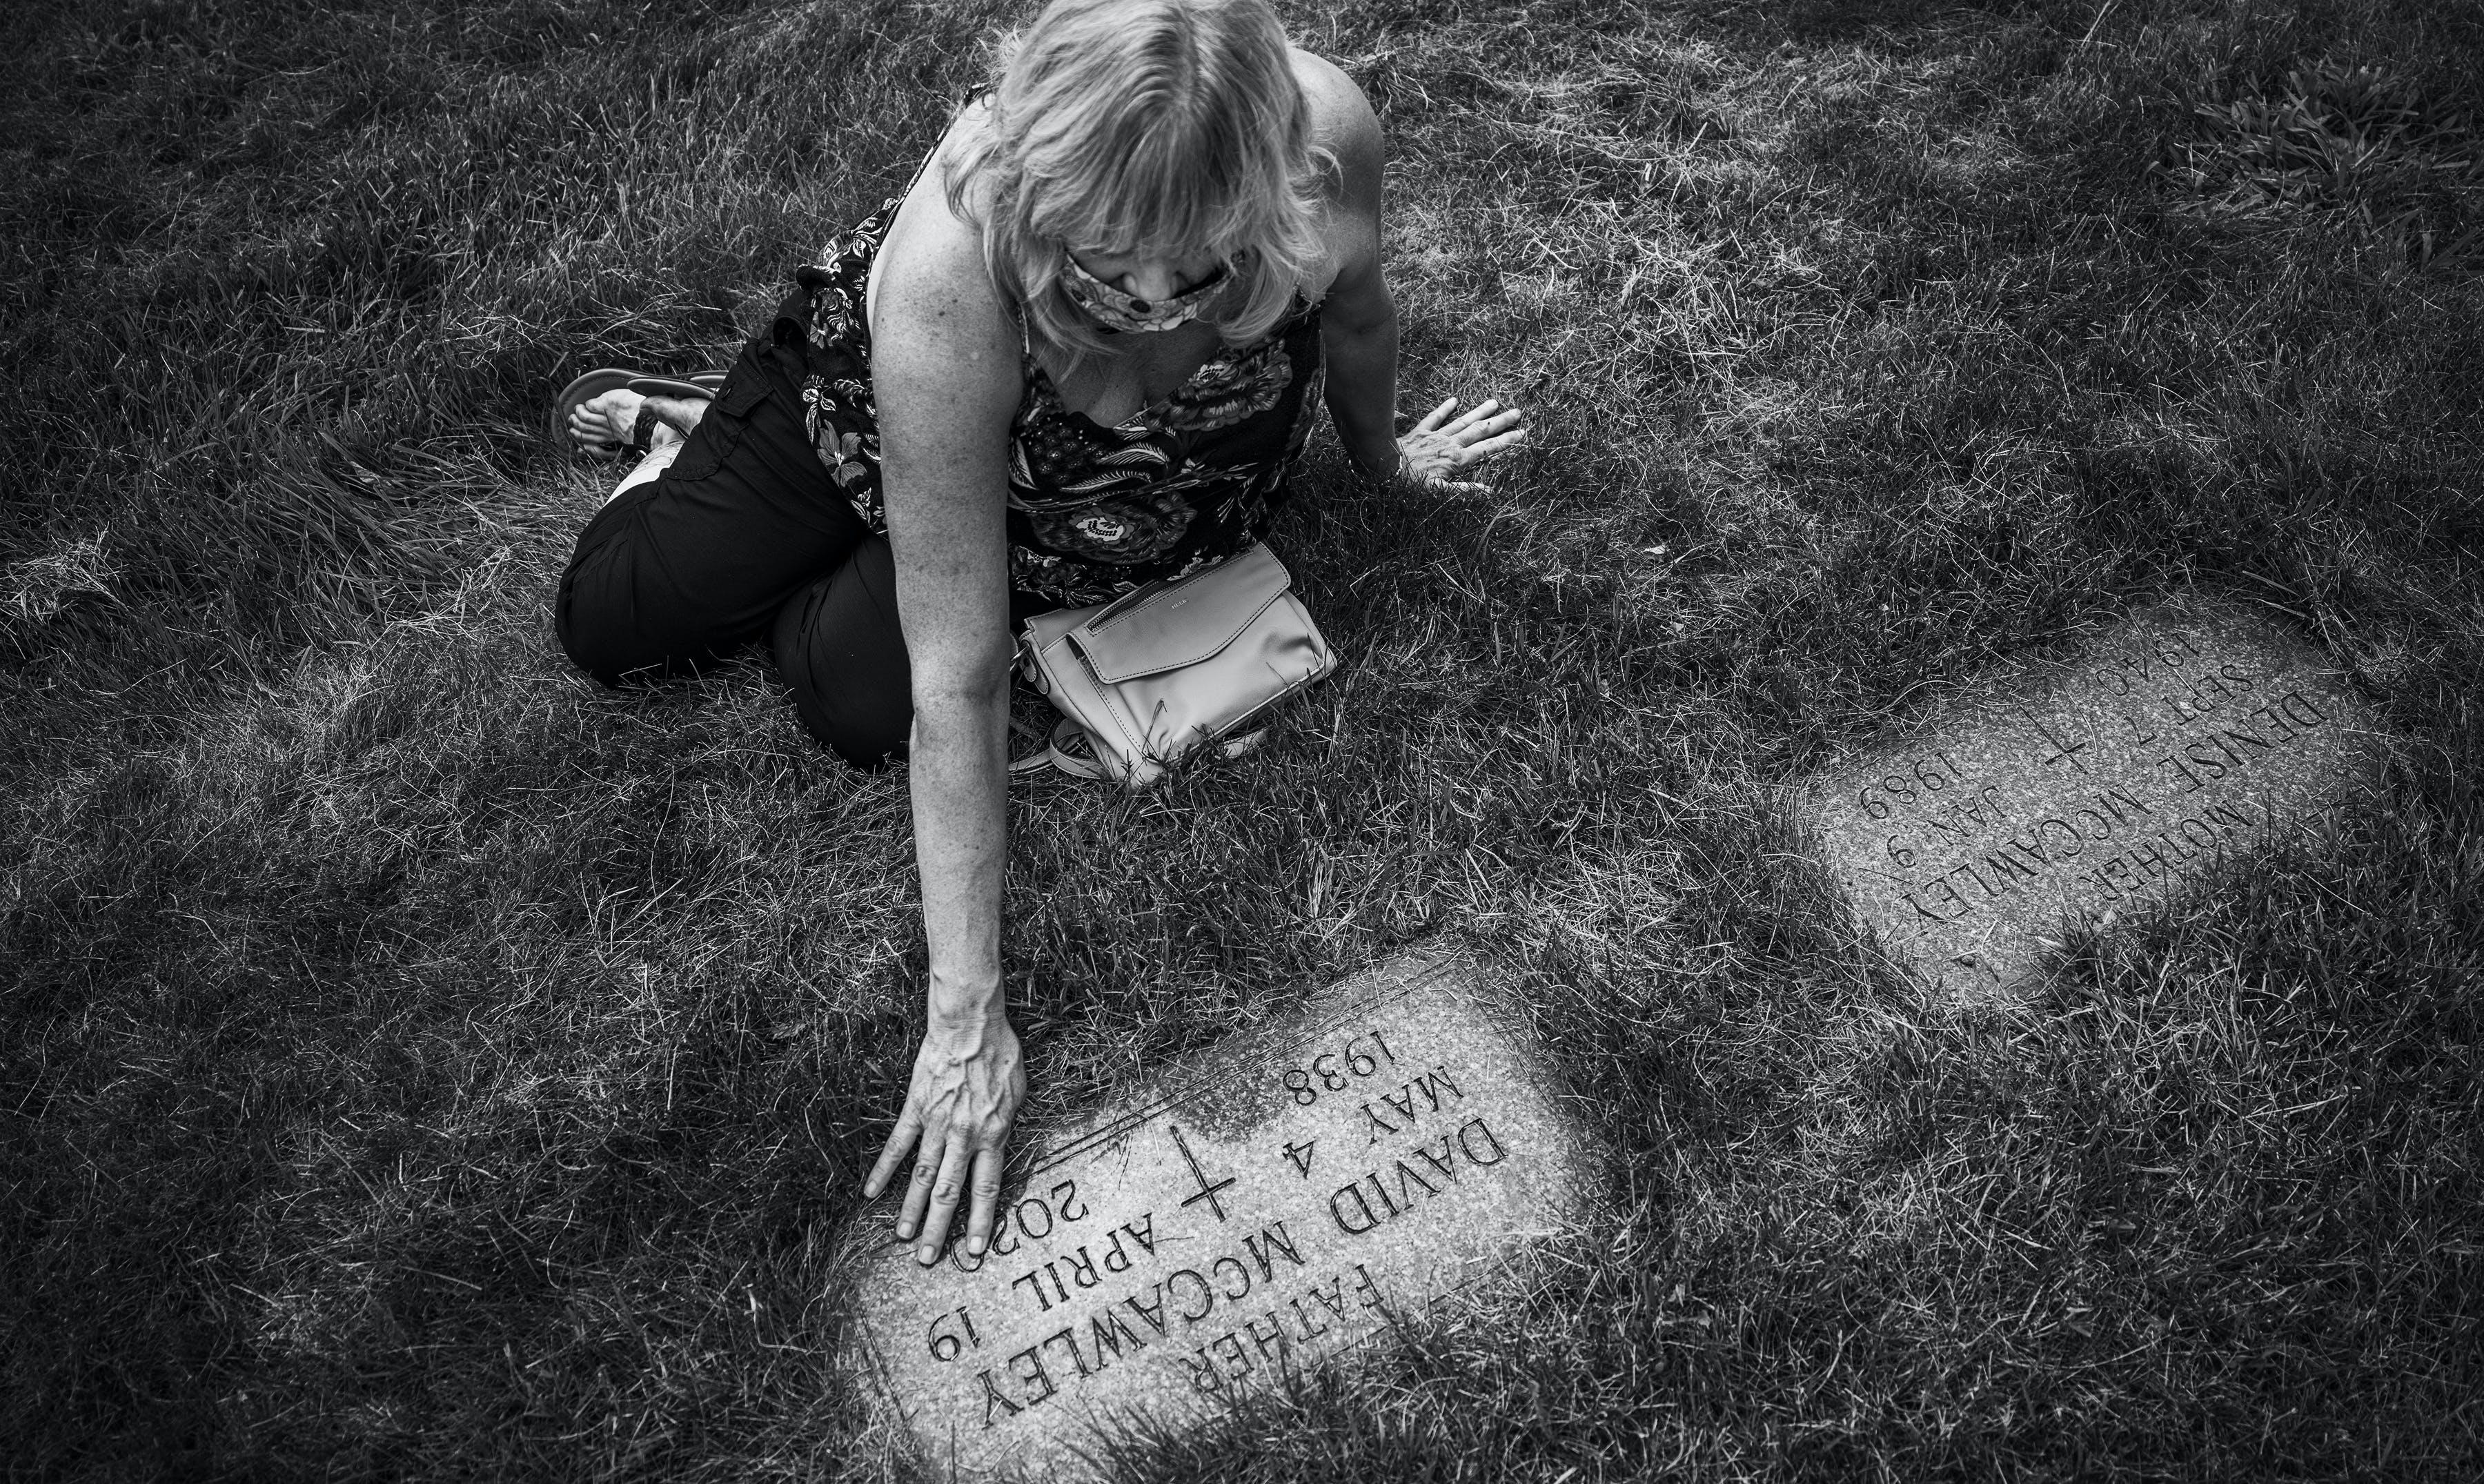 Death Was Everywhere How A Minnesota Nursing Home Descended Into A Covid Black Hole Star Tribune Texas golden wind sfm jojo tf2. minnesota nursing home descended